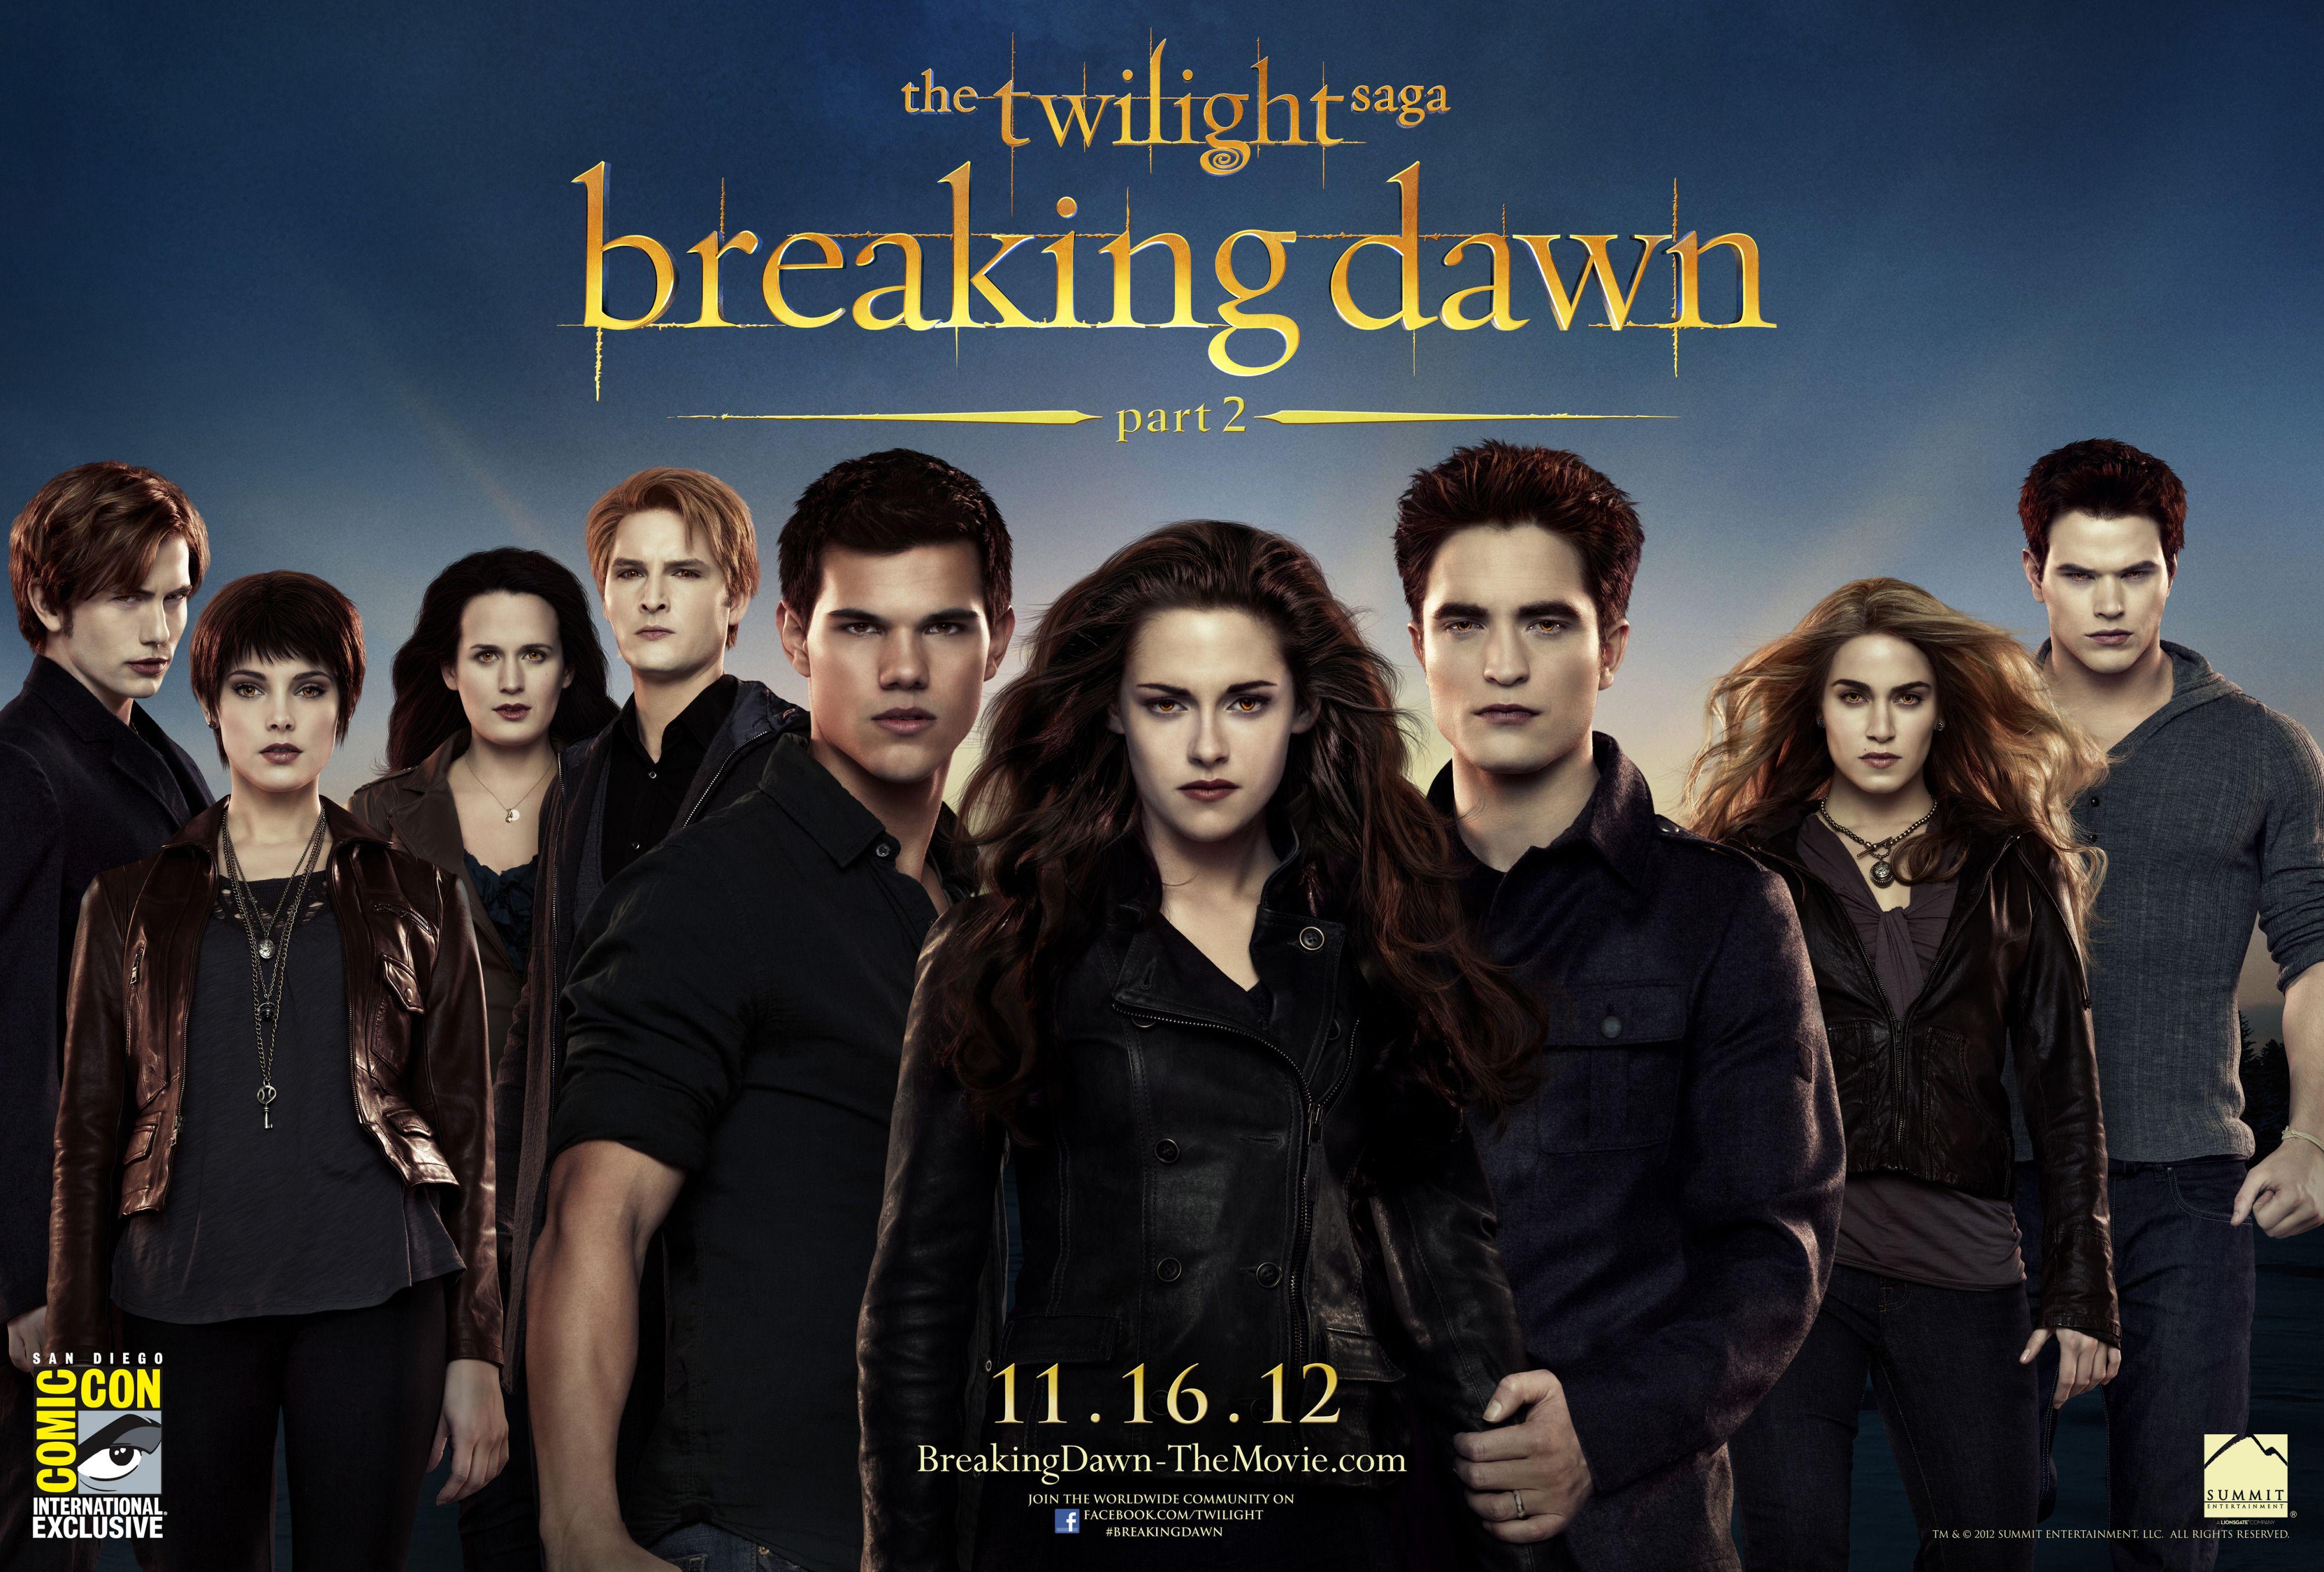 Uhq Robertpattinsonold01 Jpg The Twilight Saga Twilight Film Breaking Dawn